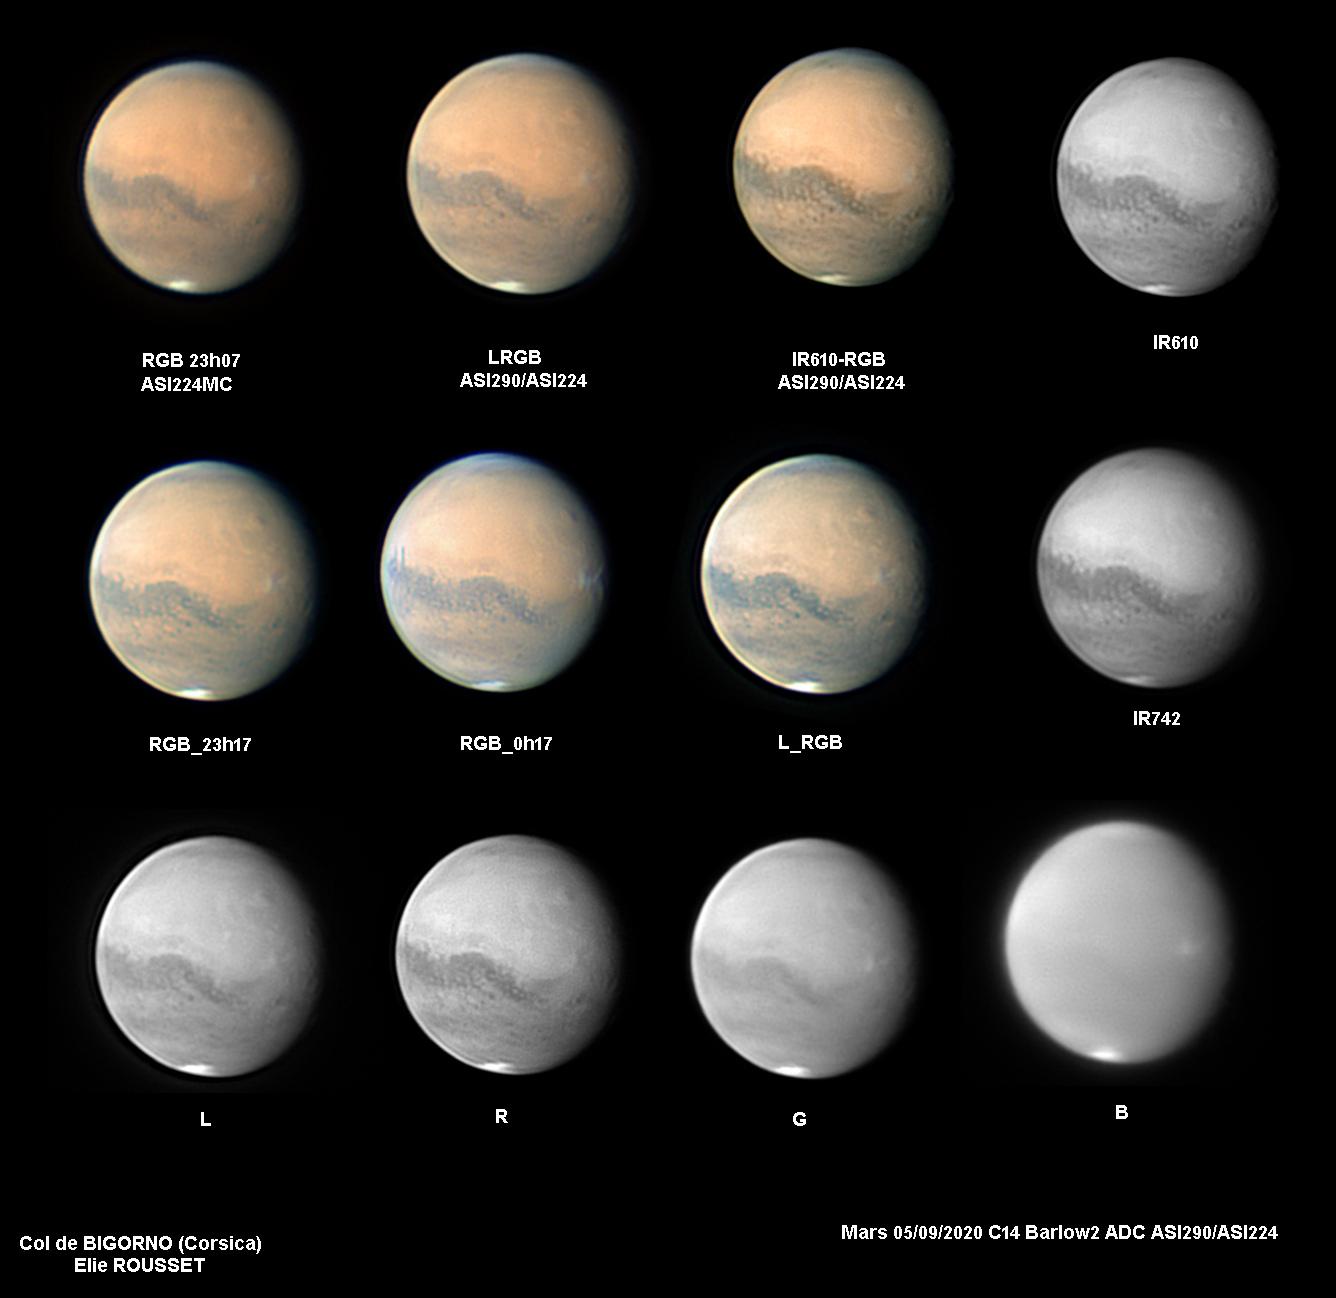 large.Mars_05_09_2020_Planche1.jpg.bb2ff2ce4369d93e025efee072620cbe.jpg